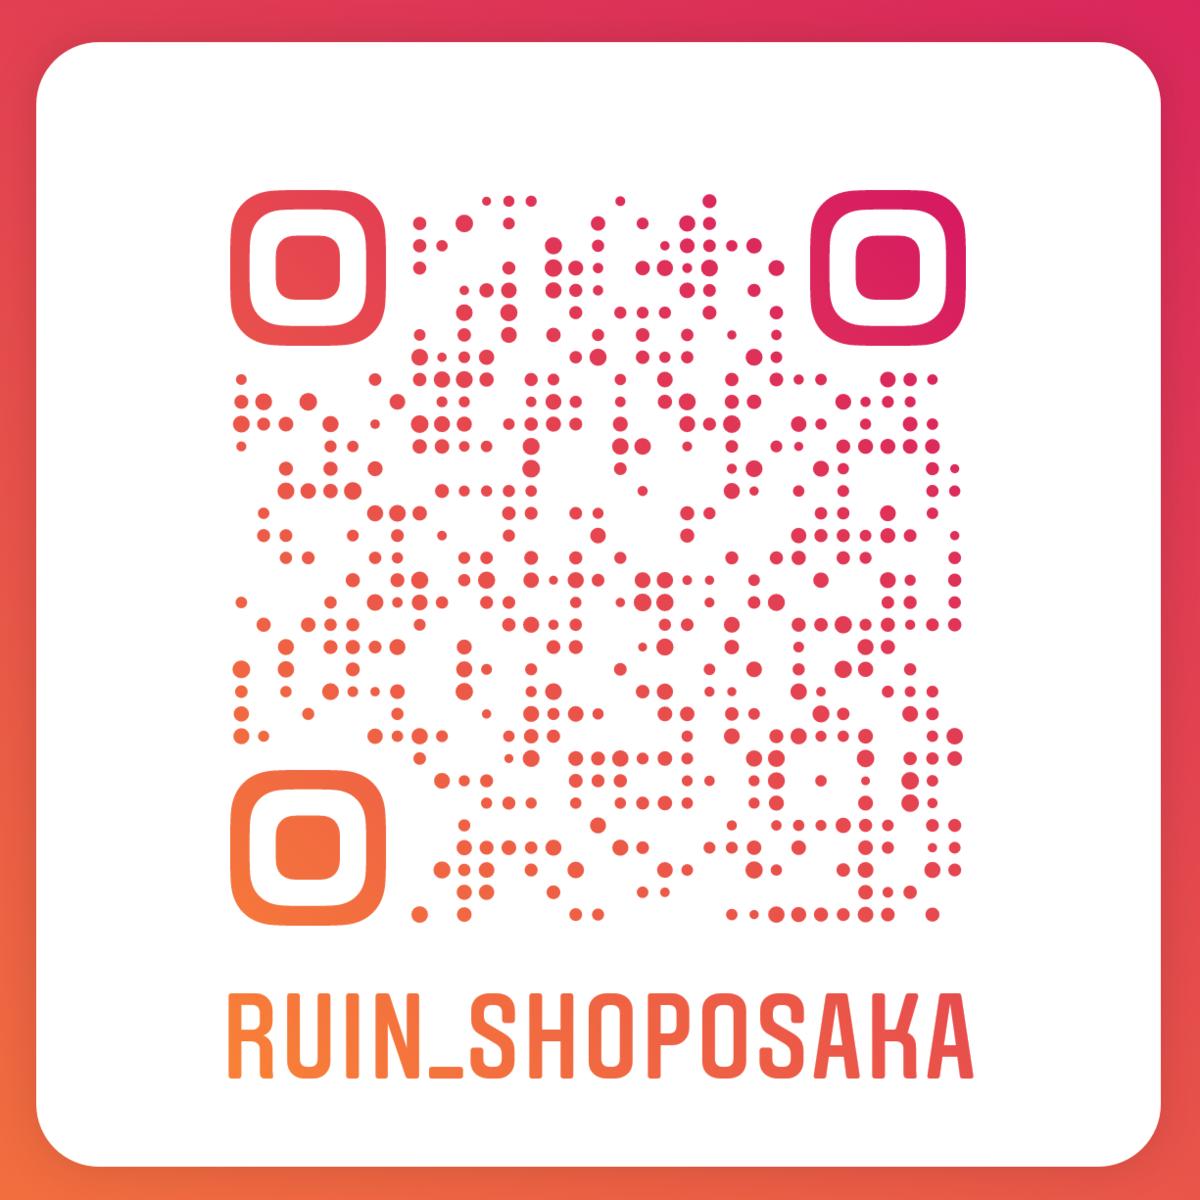 f:id:ruin-selectshop:20191227131035p:plain